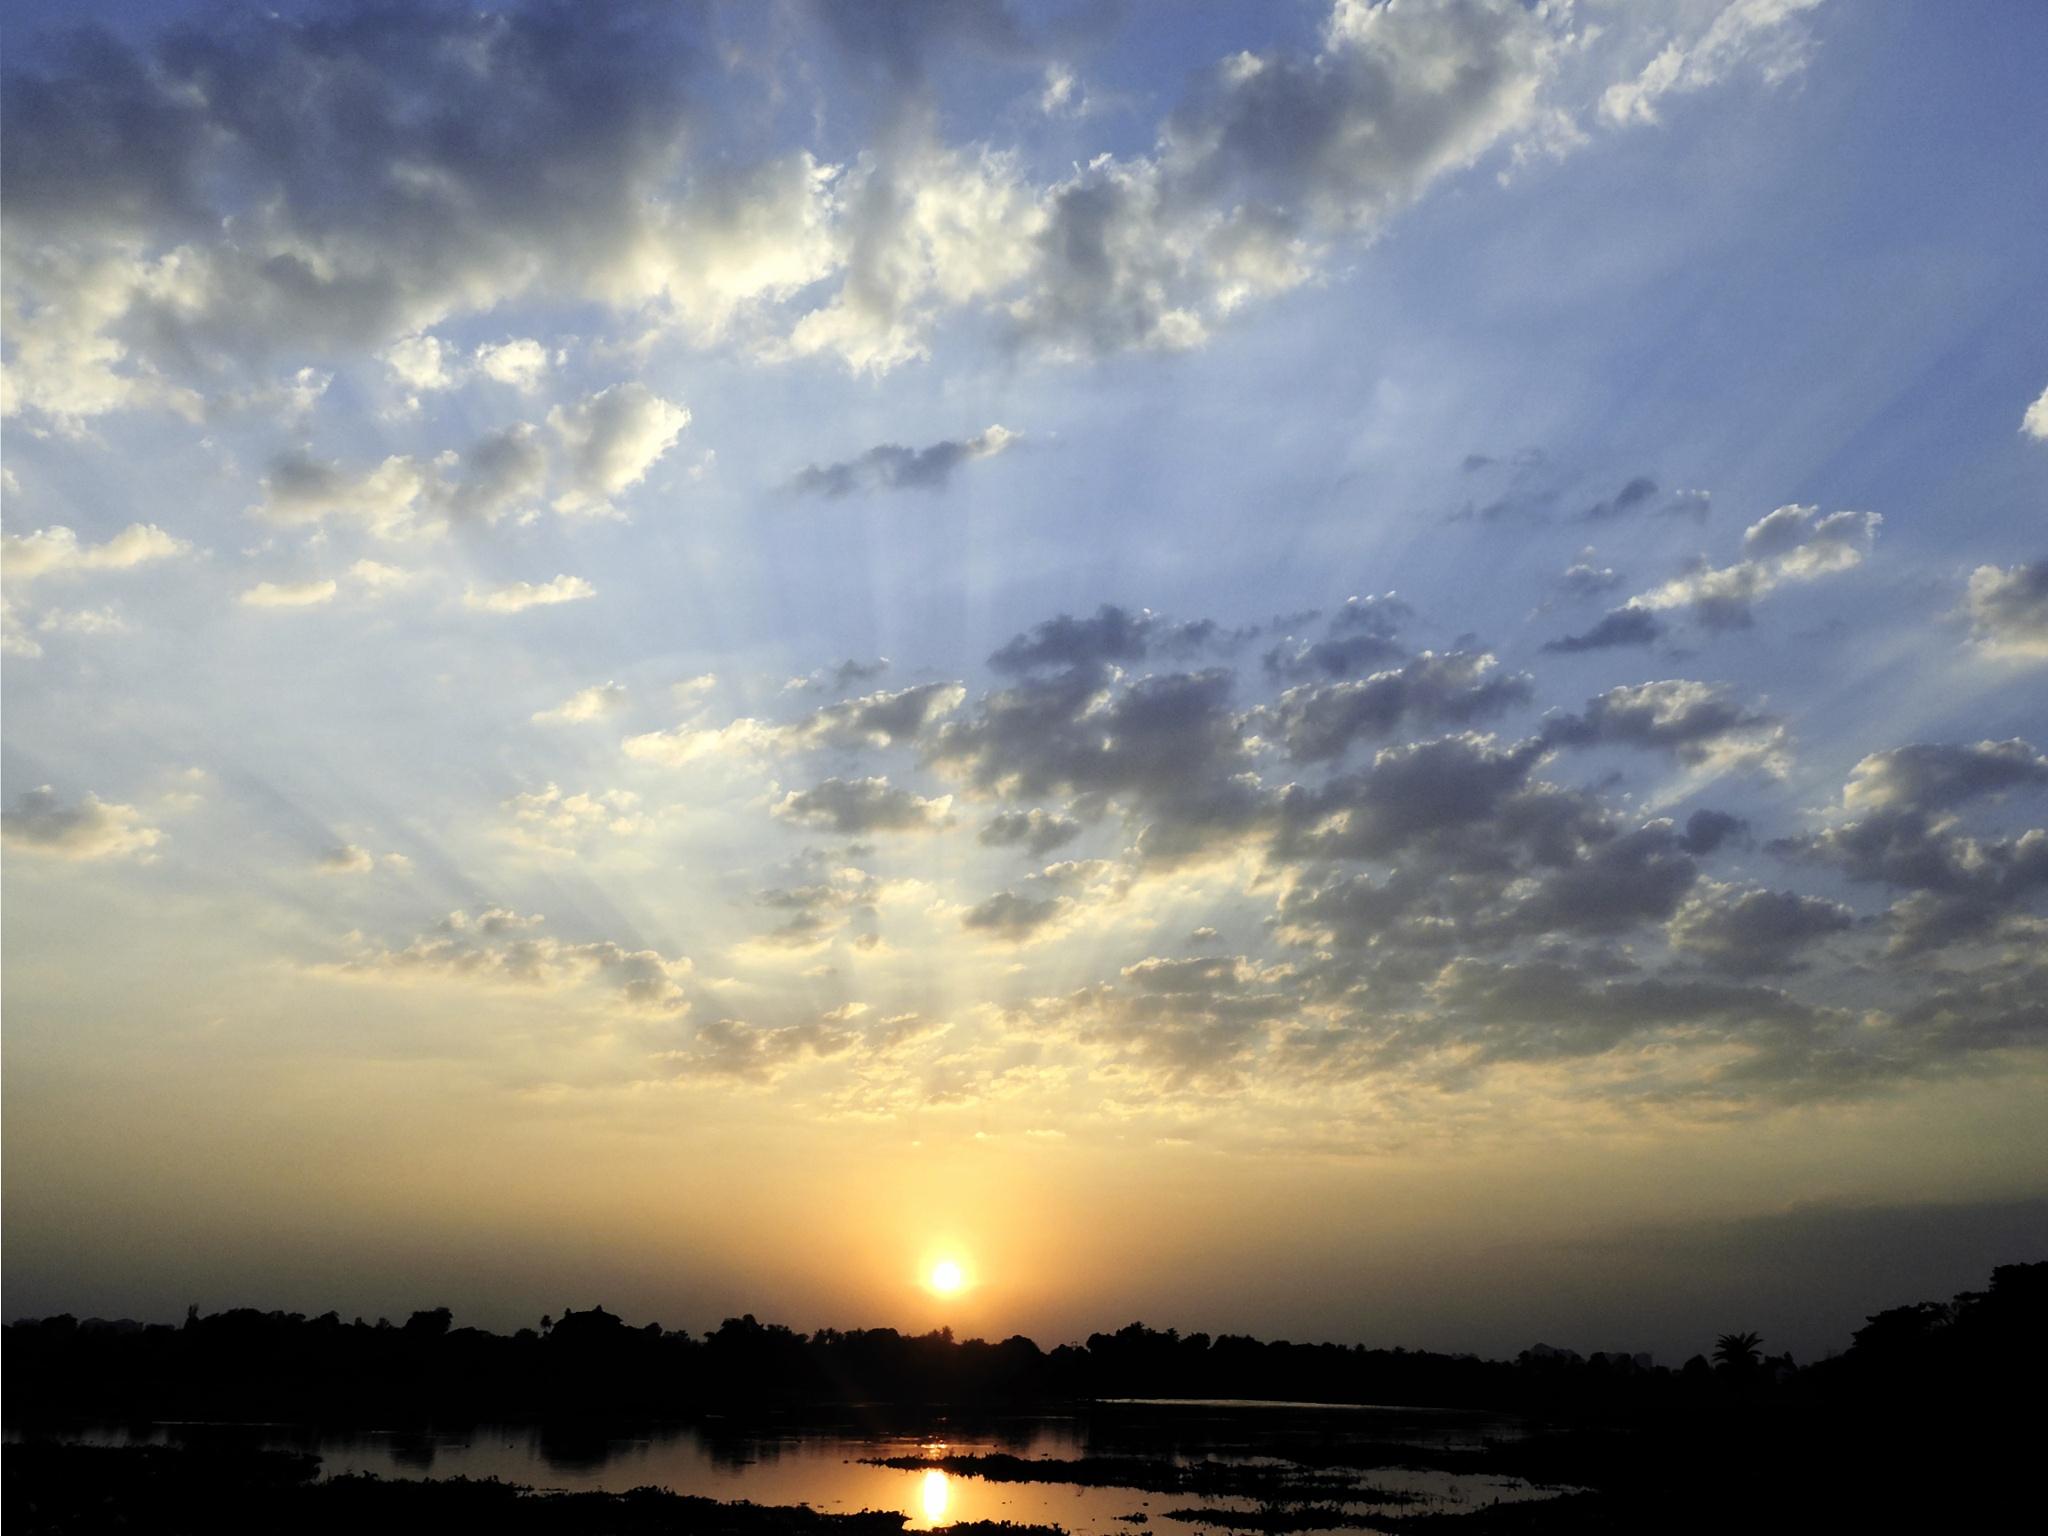 SUN RAYS by Shreyans S Shah